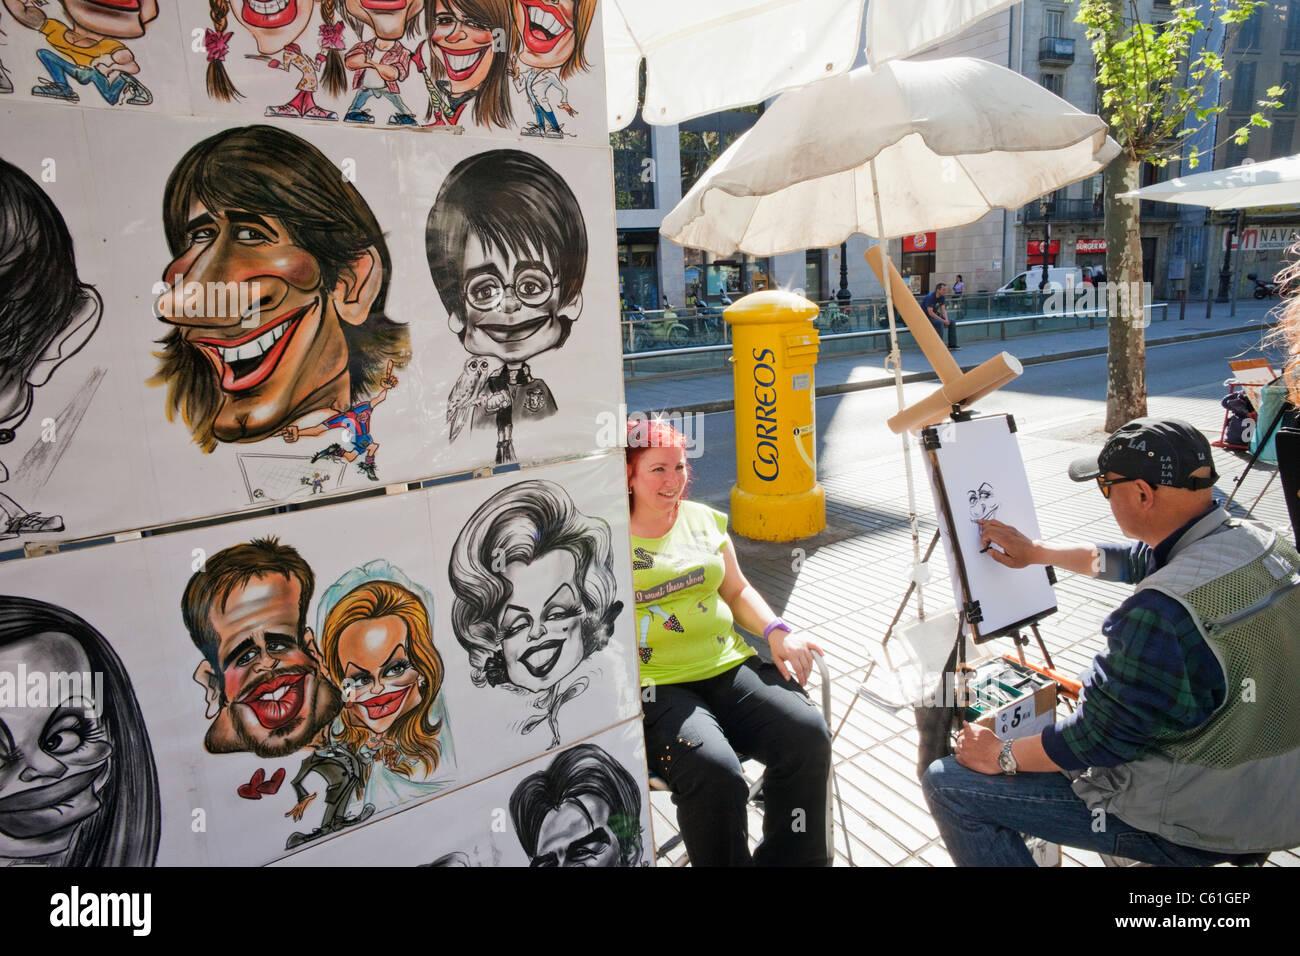 Spain Barcelona Las Ramblas Caricature Artist Stock Photo Alamy